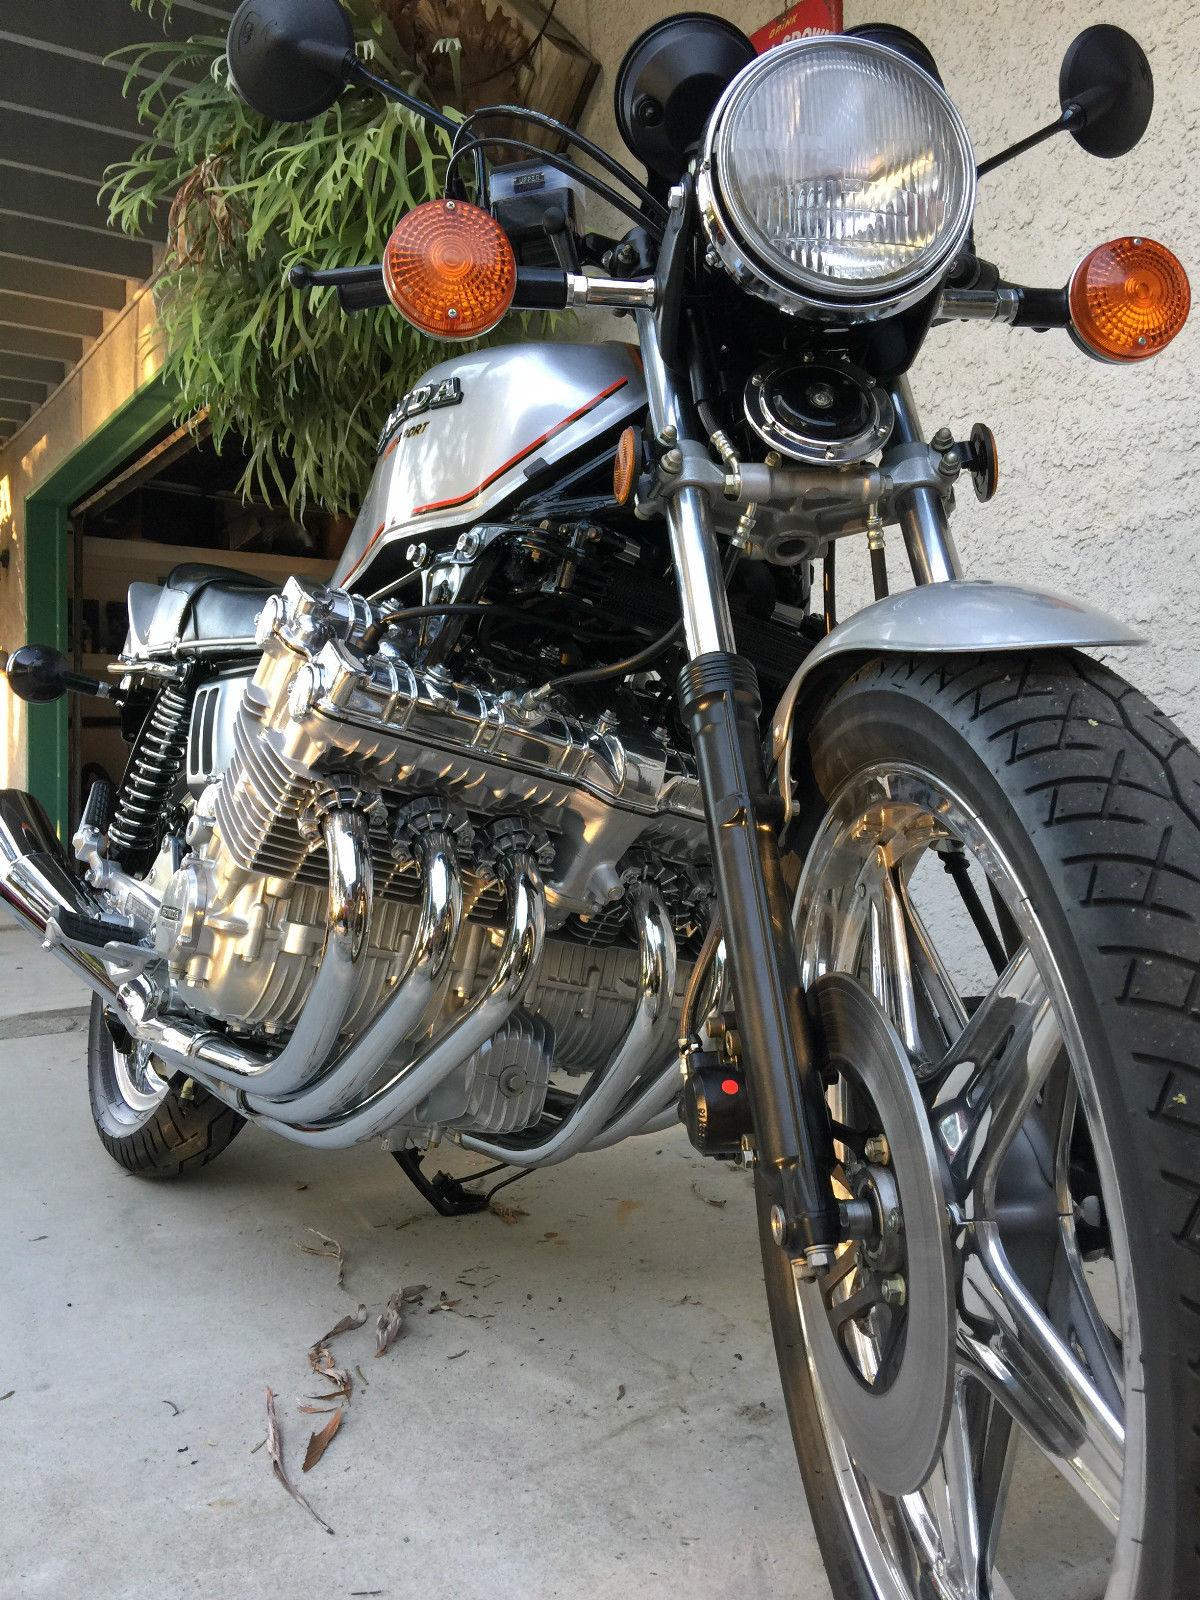 Restored Honda Cbx1000 1979 Photographs At Classic Bikes